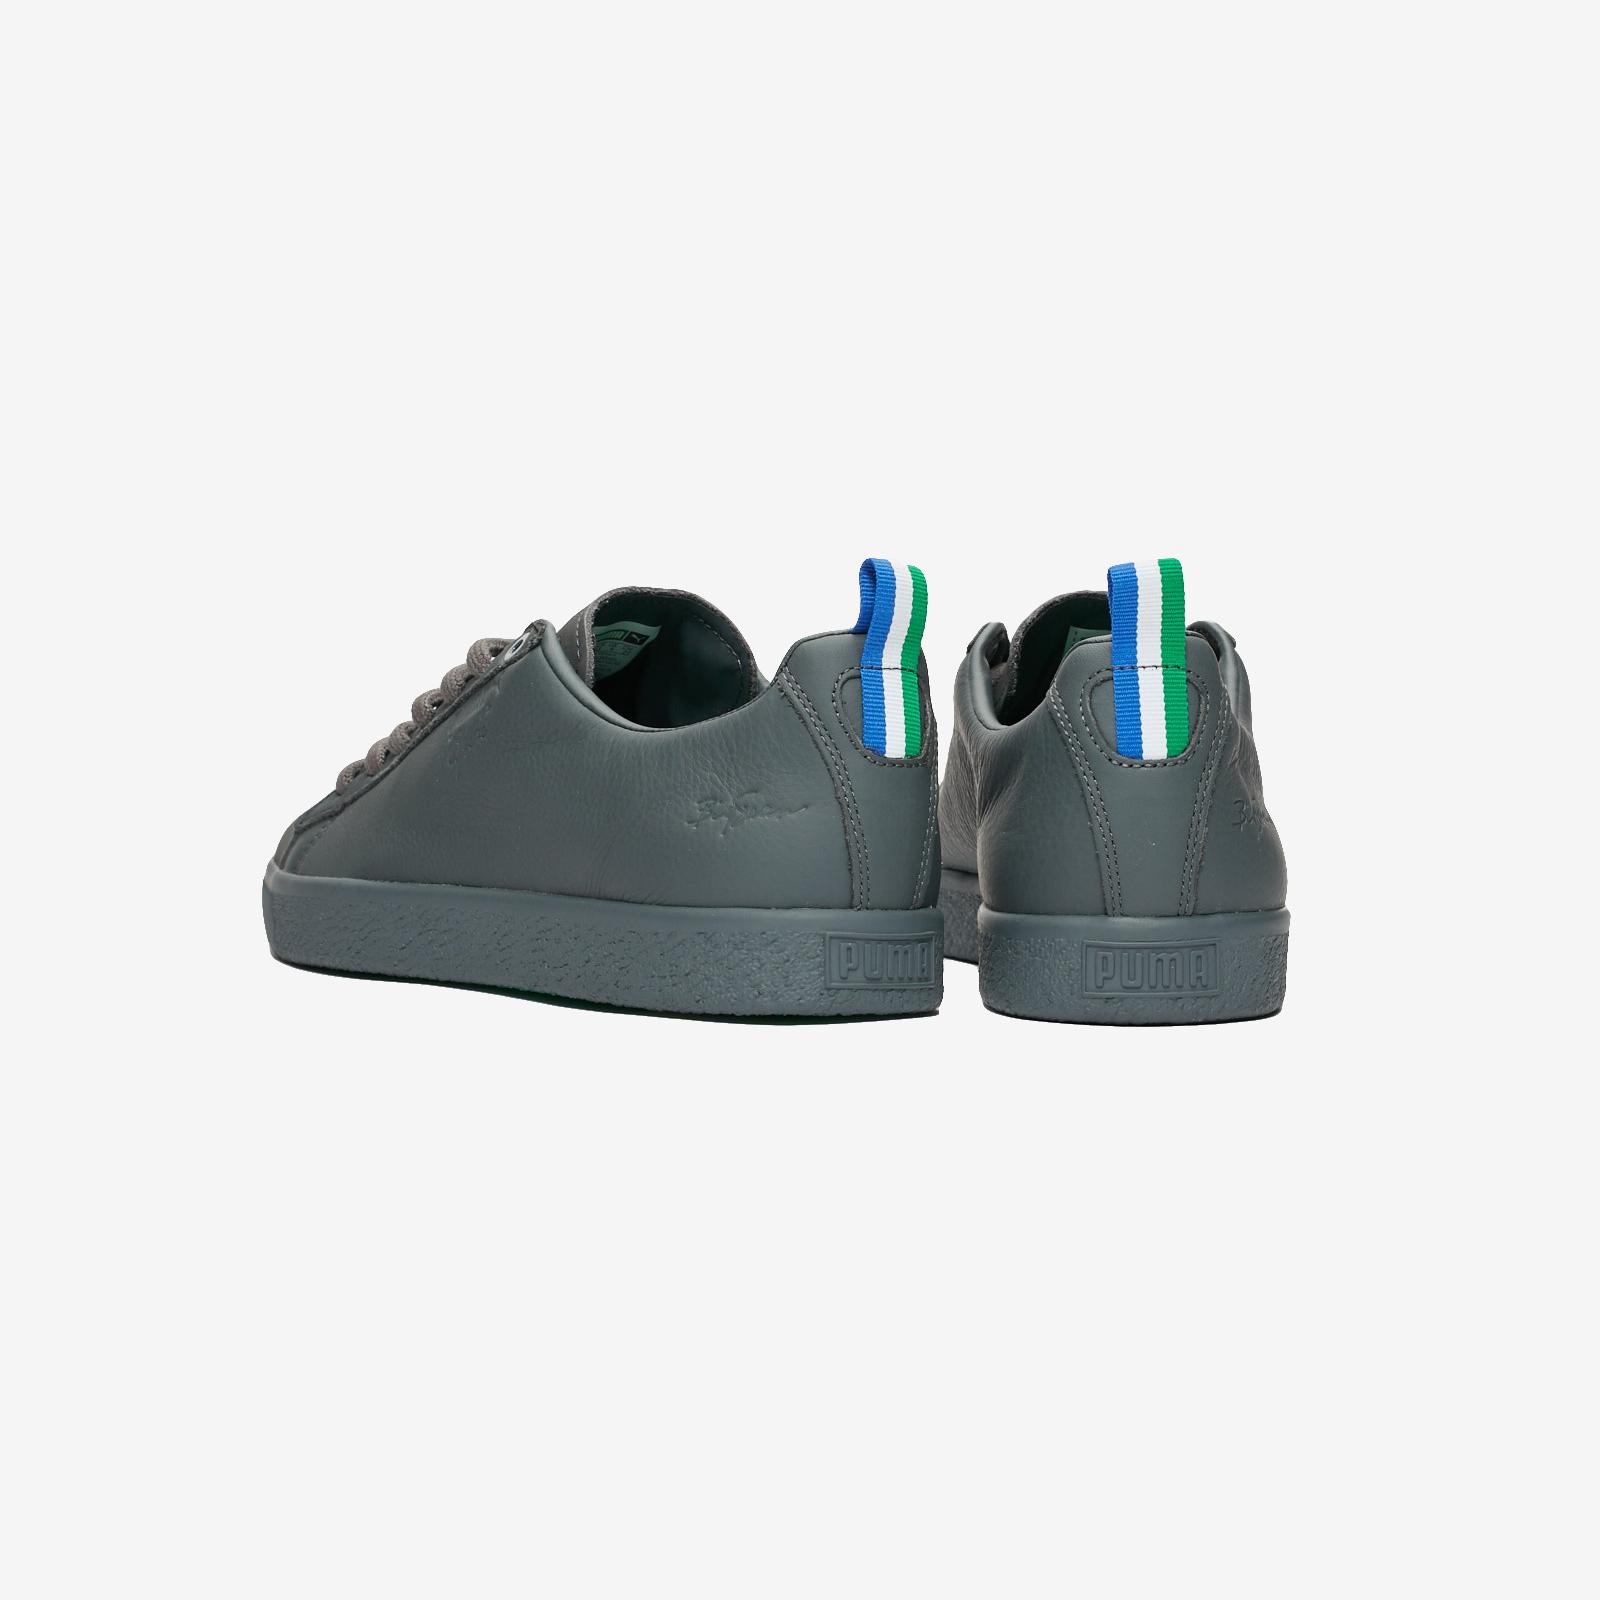 watch 43359 bfdcd Puma Clyde x Big Sean - 367415-01 - Sneakersnstuff ...